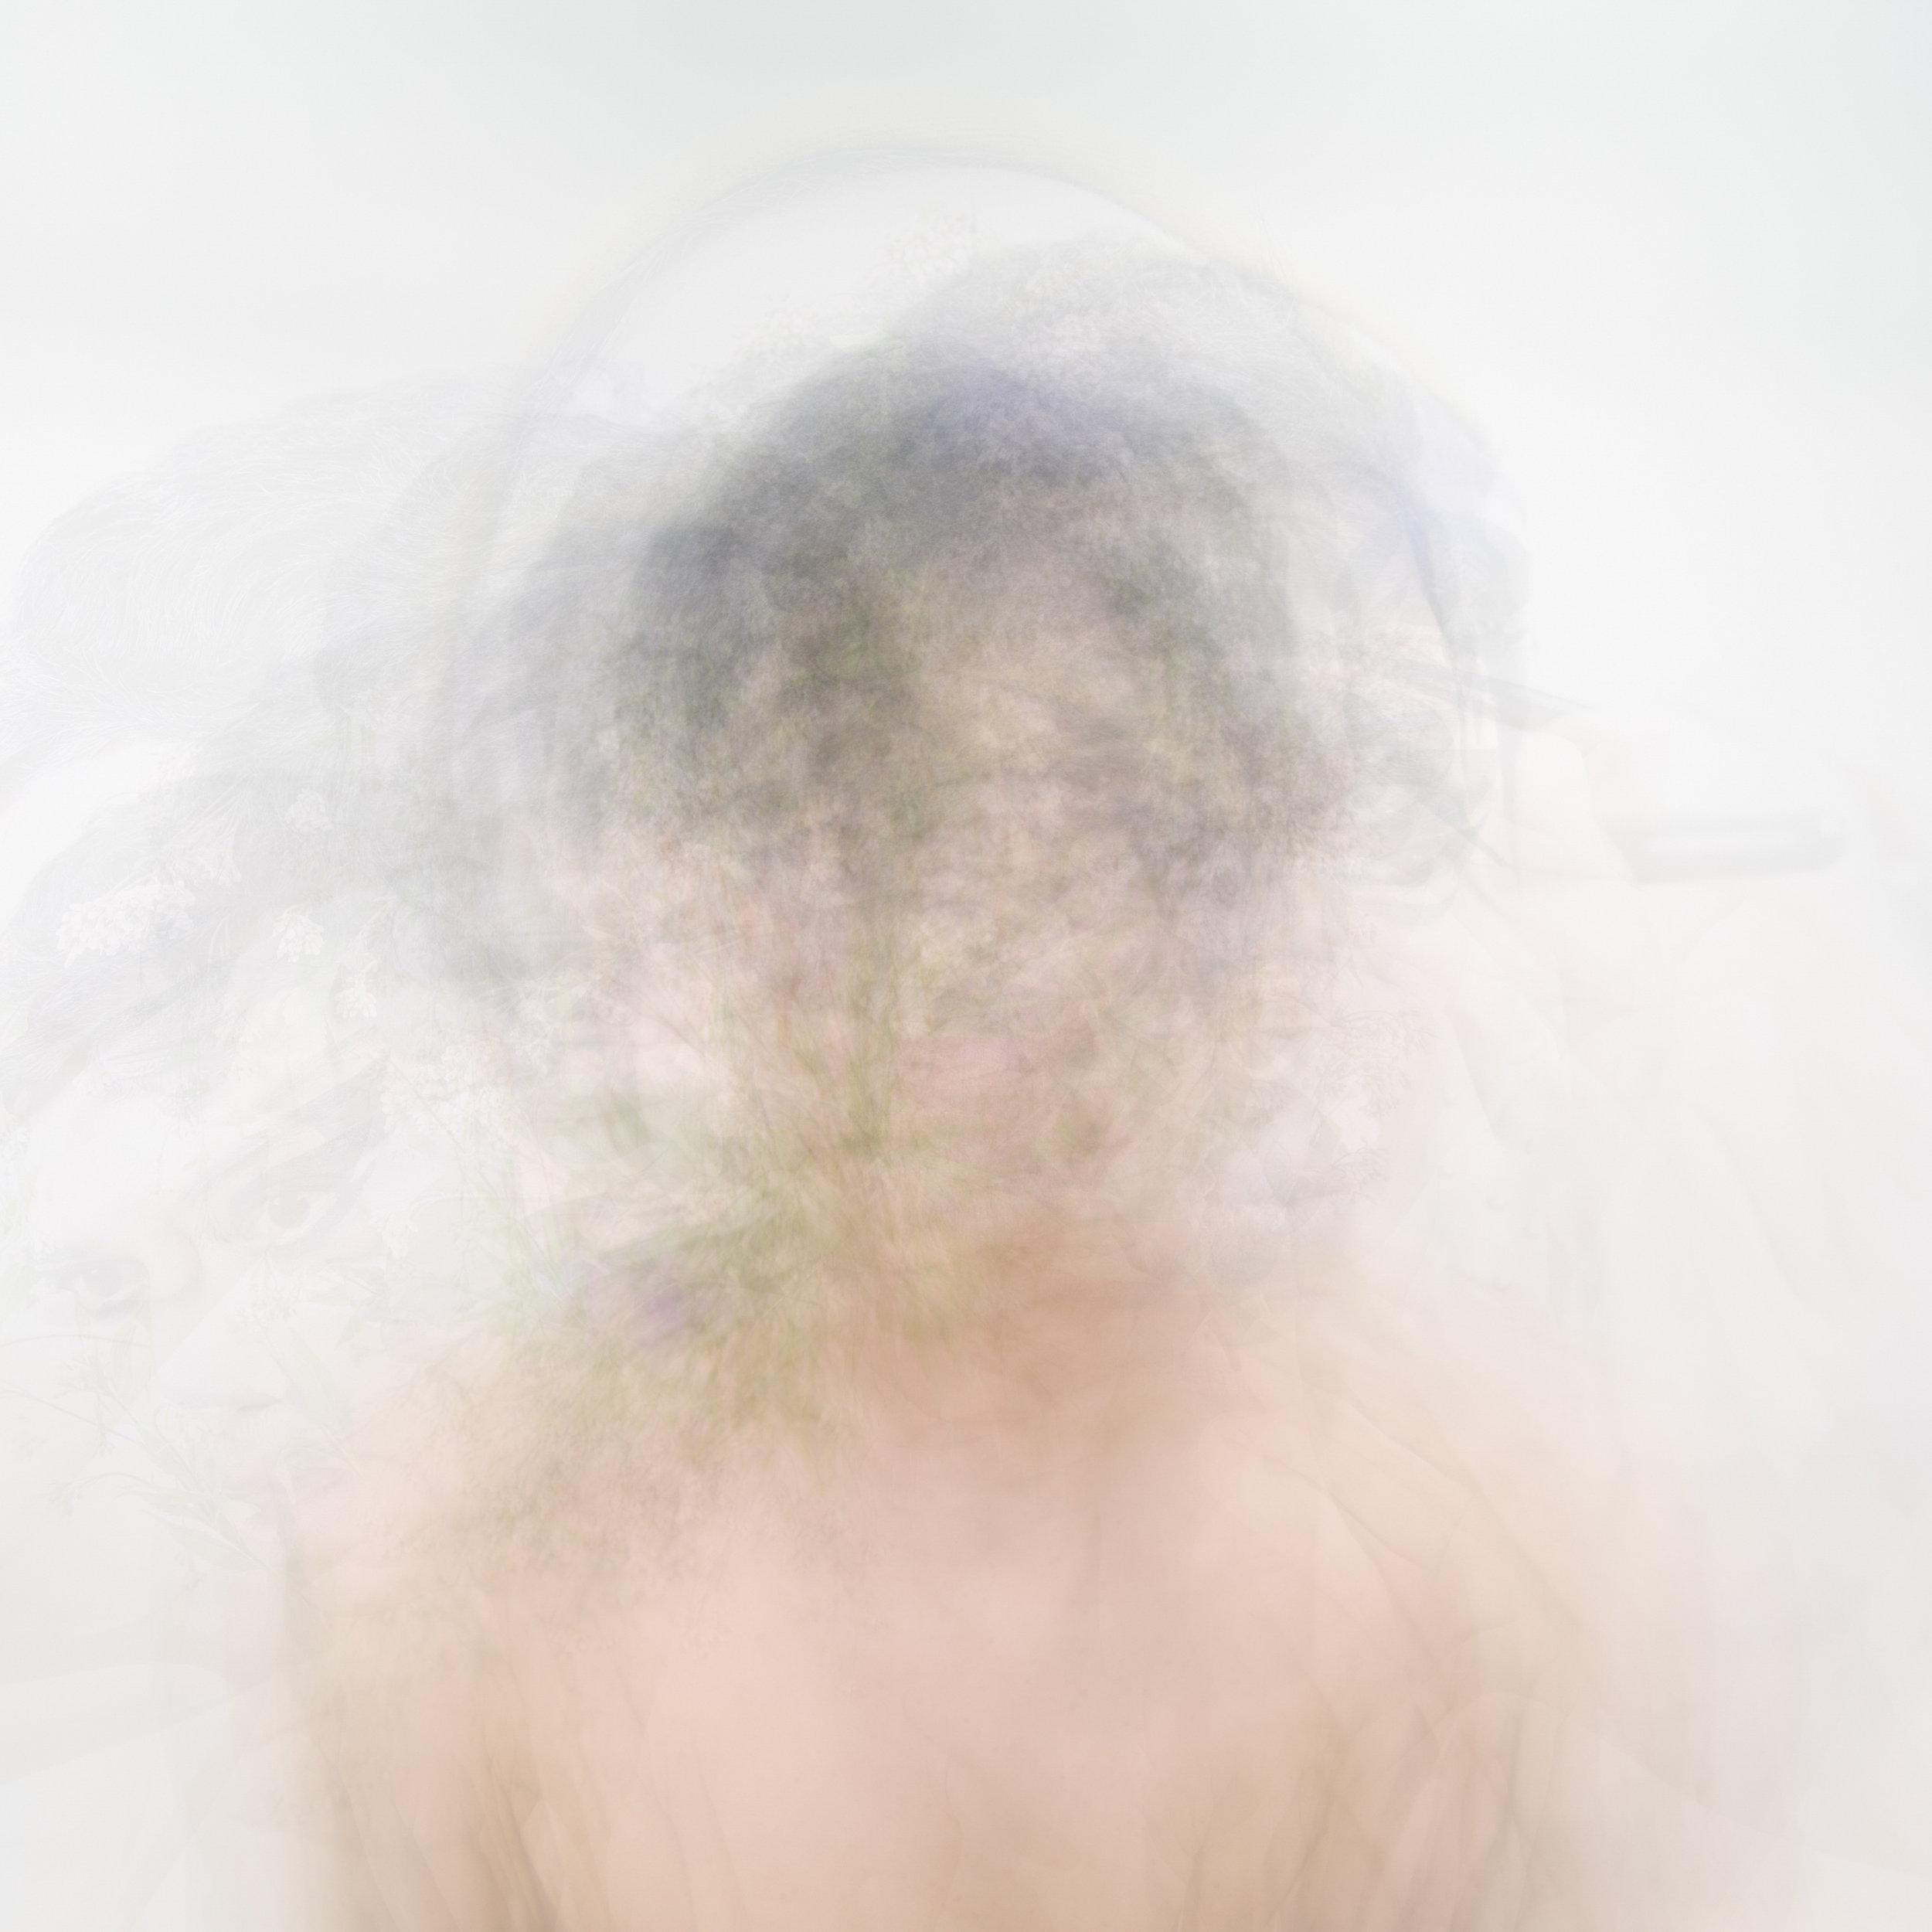 Nada(untitled), 3h 16m, 30x30 inches, pigment print, paper, 2017